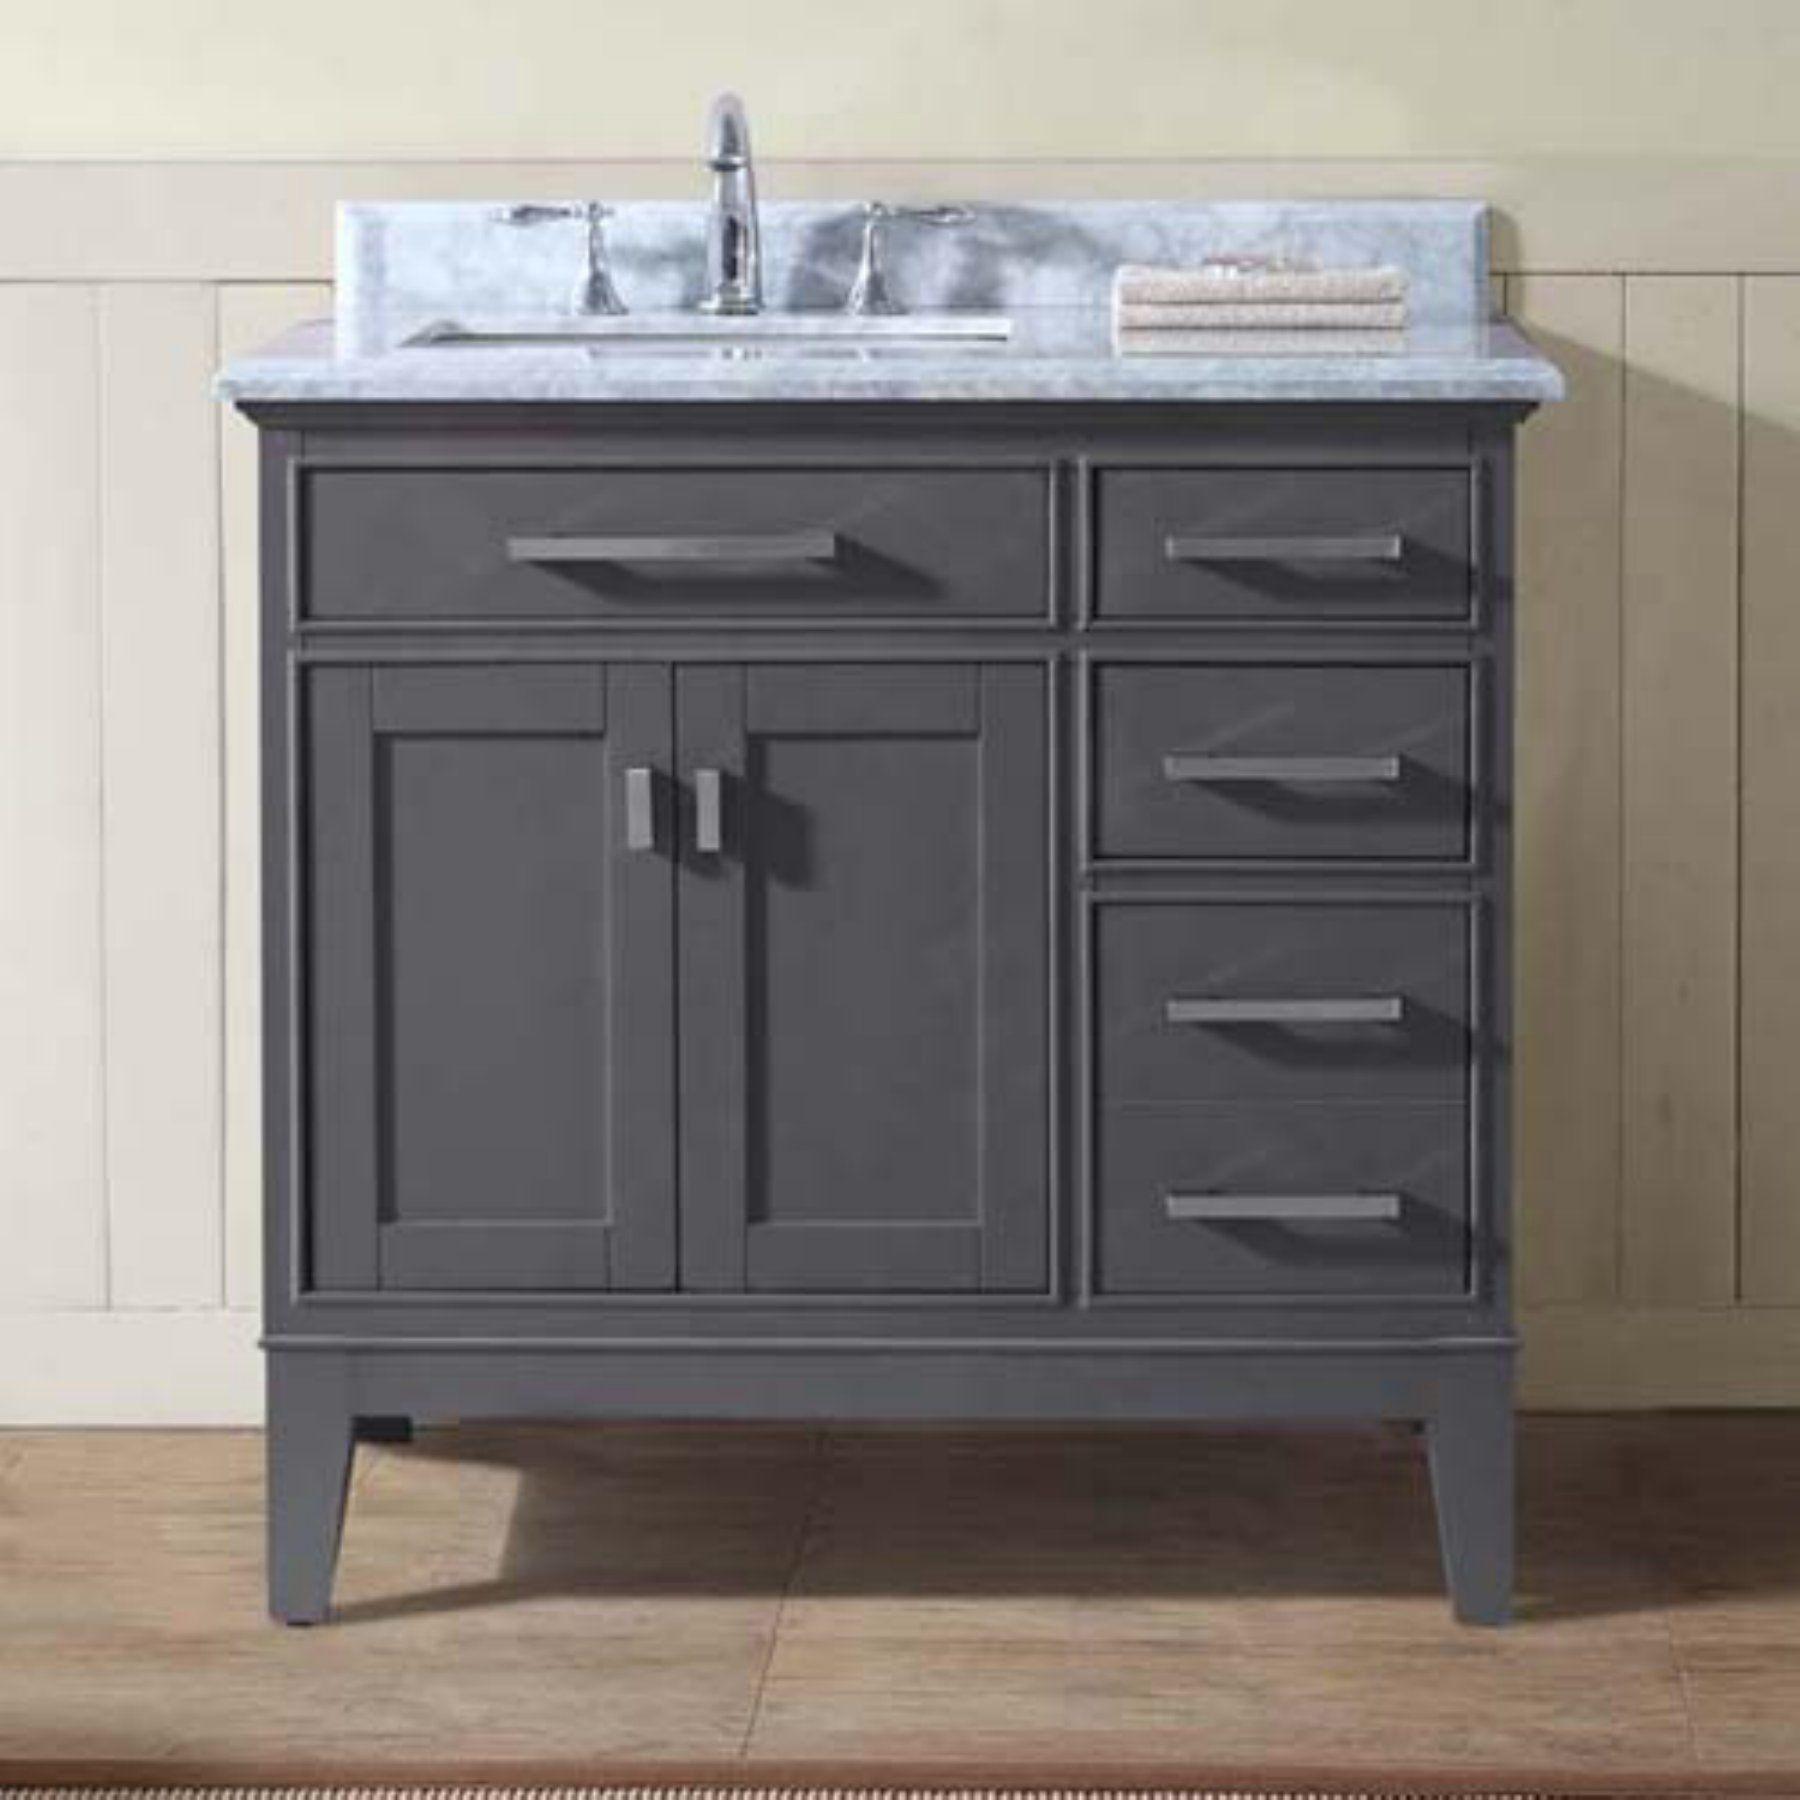 Sets bathroom vanity ari kitchen second - Ari Kitchen And Bath Danny 36 In Single Bathroom Vanity Set Maple Gray